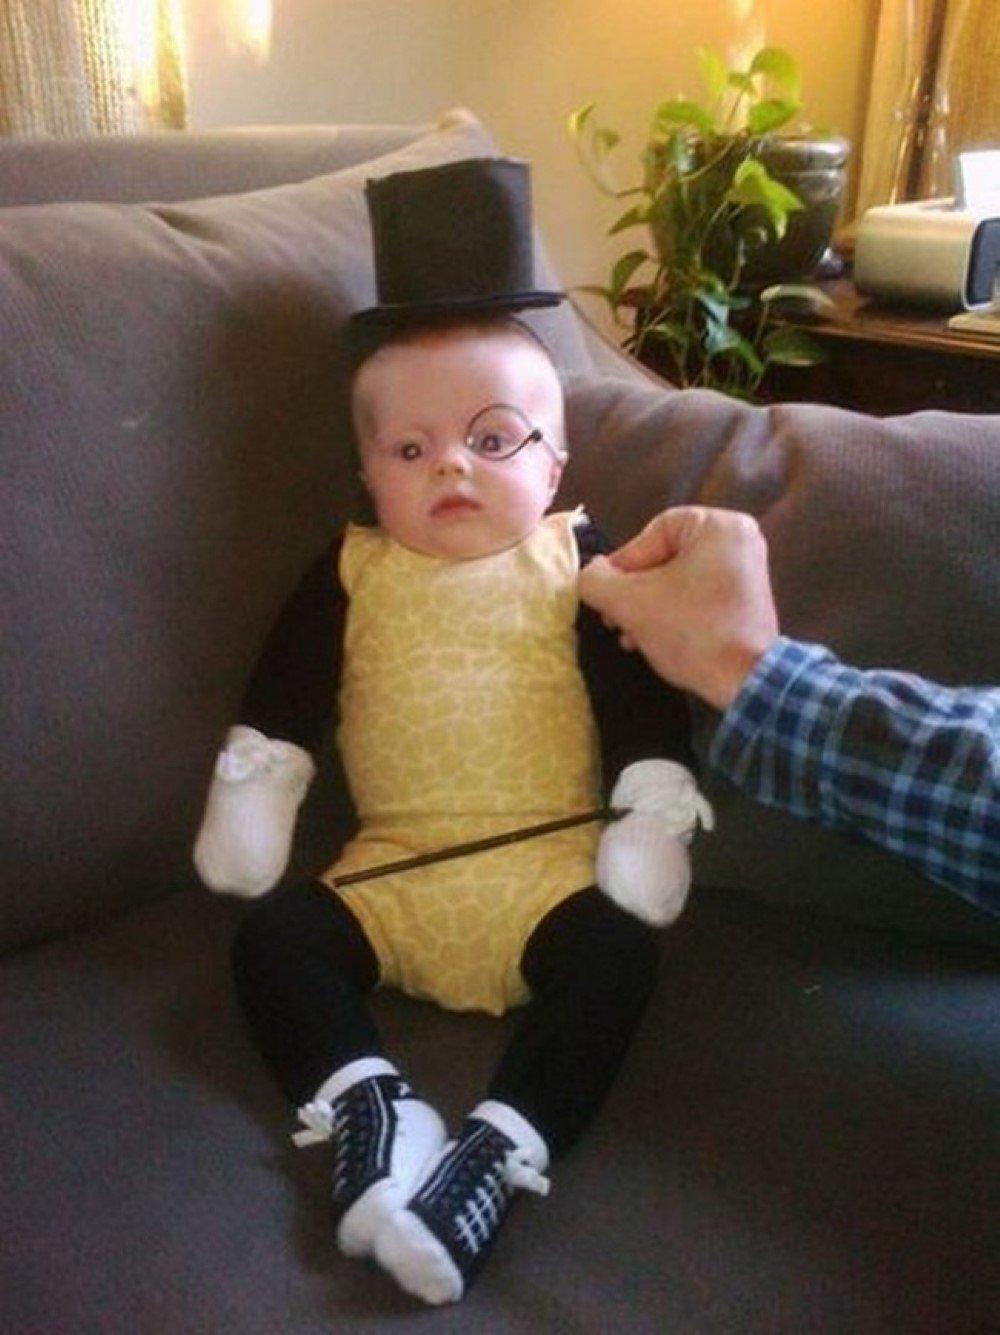 10 Nice Cute Baby Halloween Costume Ideas 35 baby halloween costumes that are as cute as they are scary